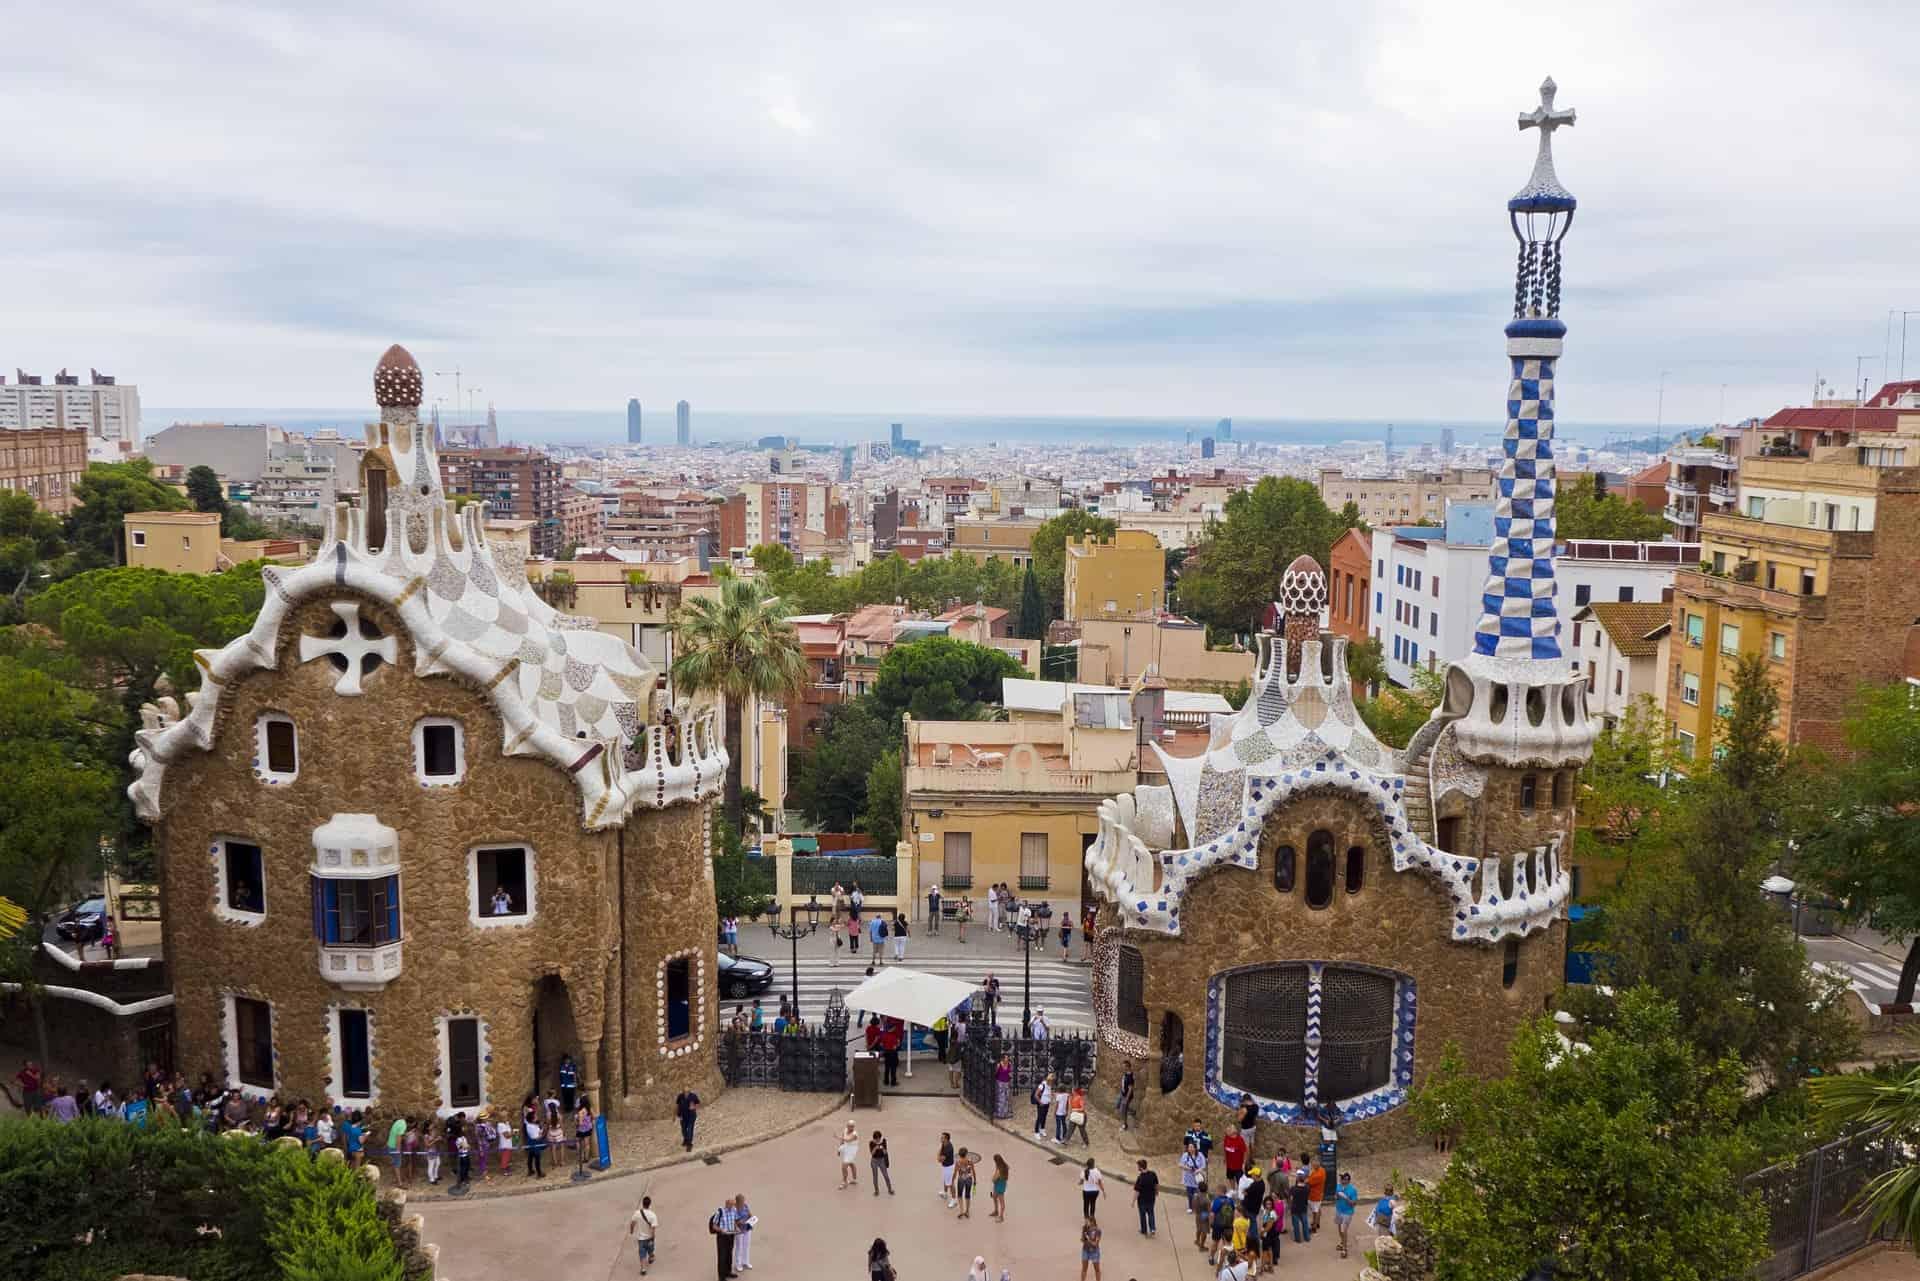 Park Guell - Obras de Gaudí